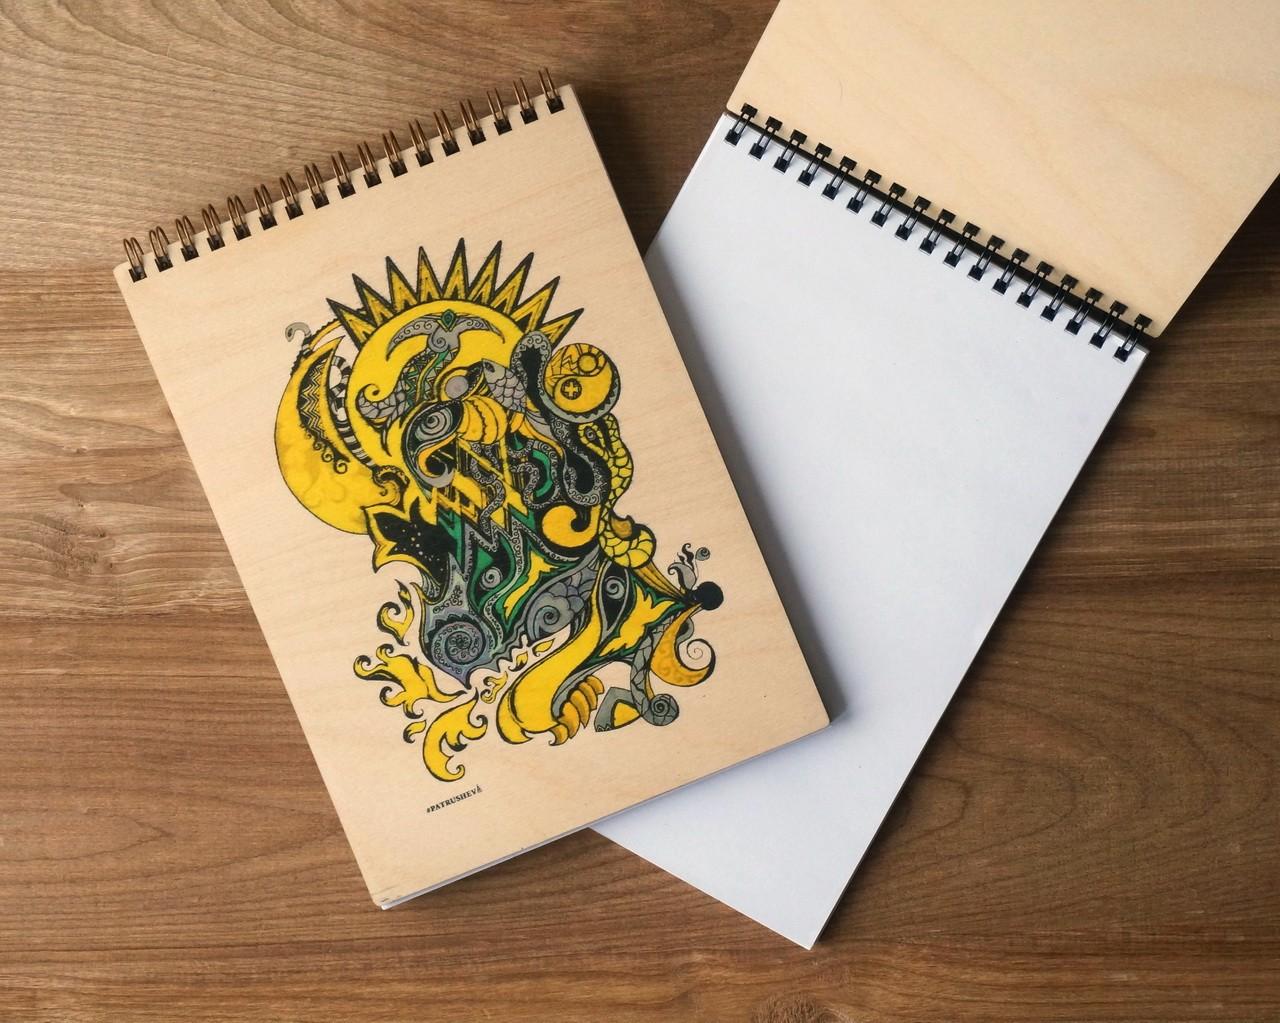 Деревянный блокнот Сон шамана в жёлтом